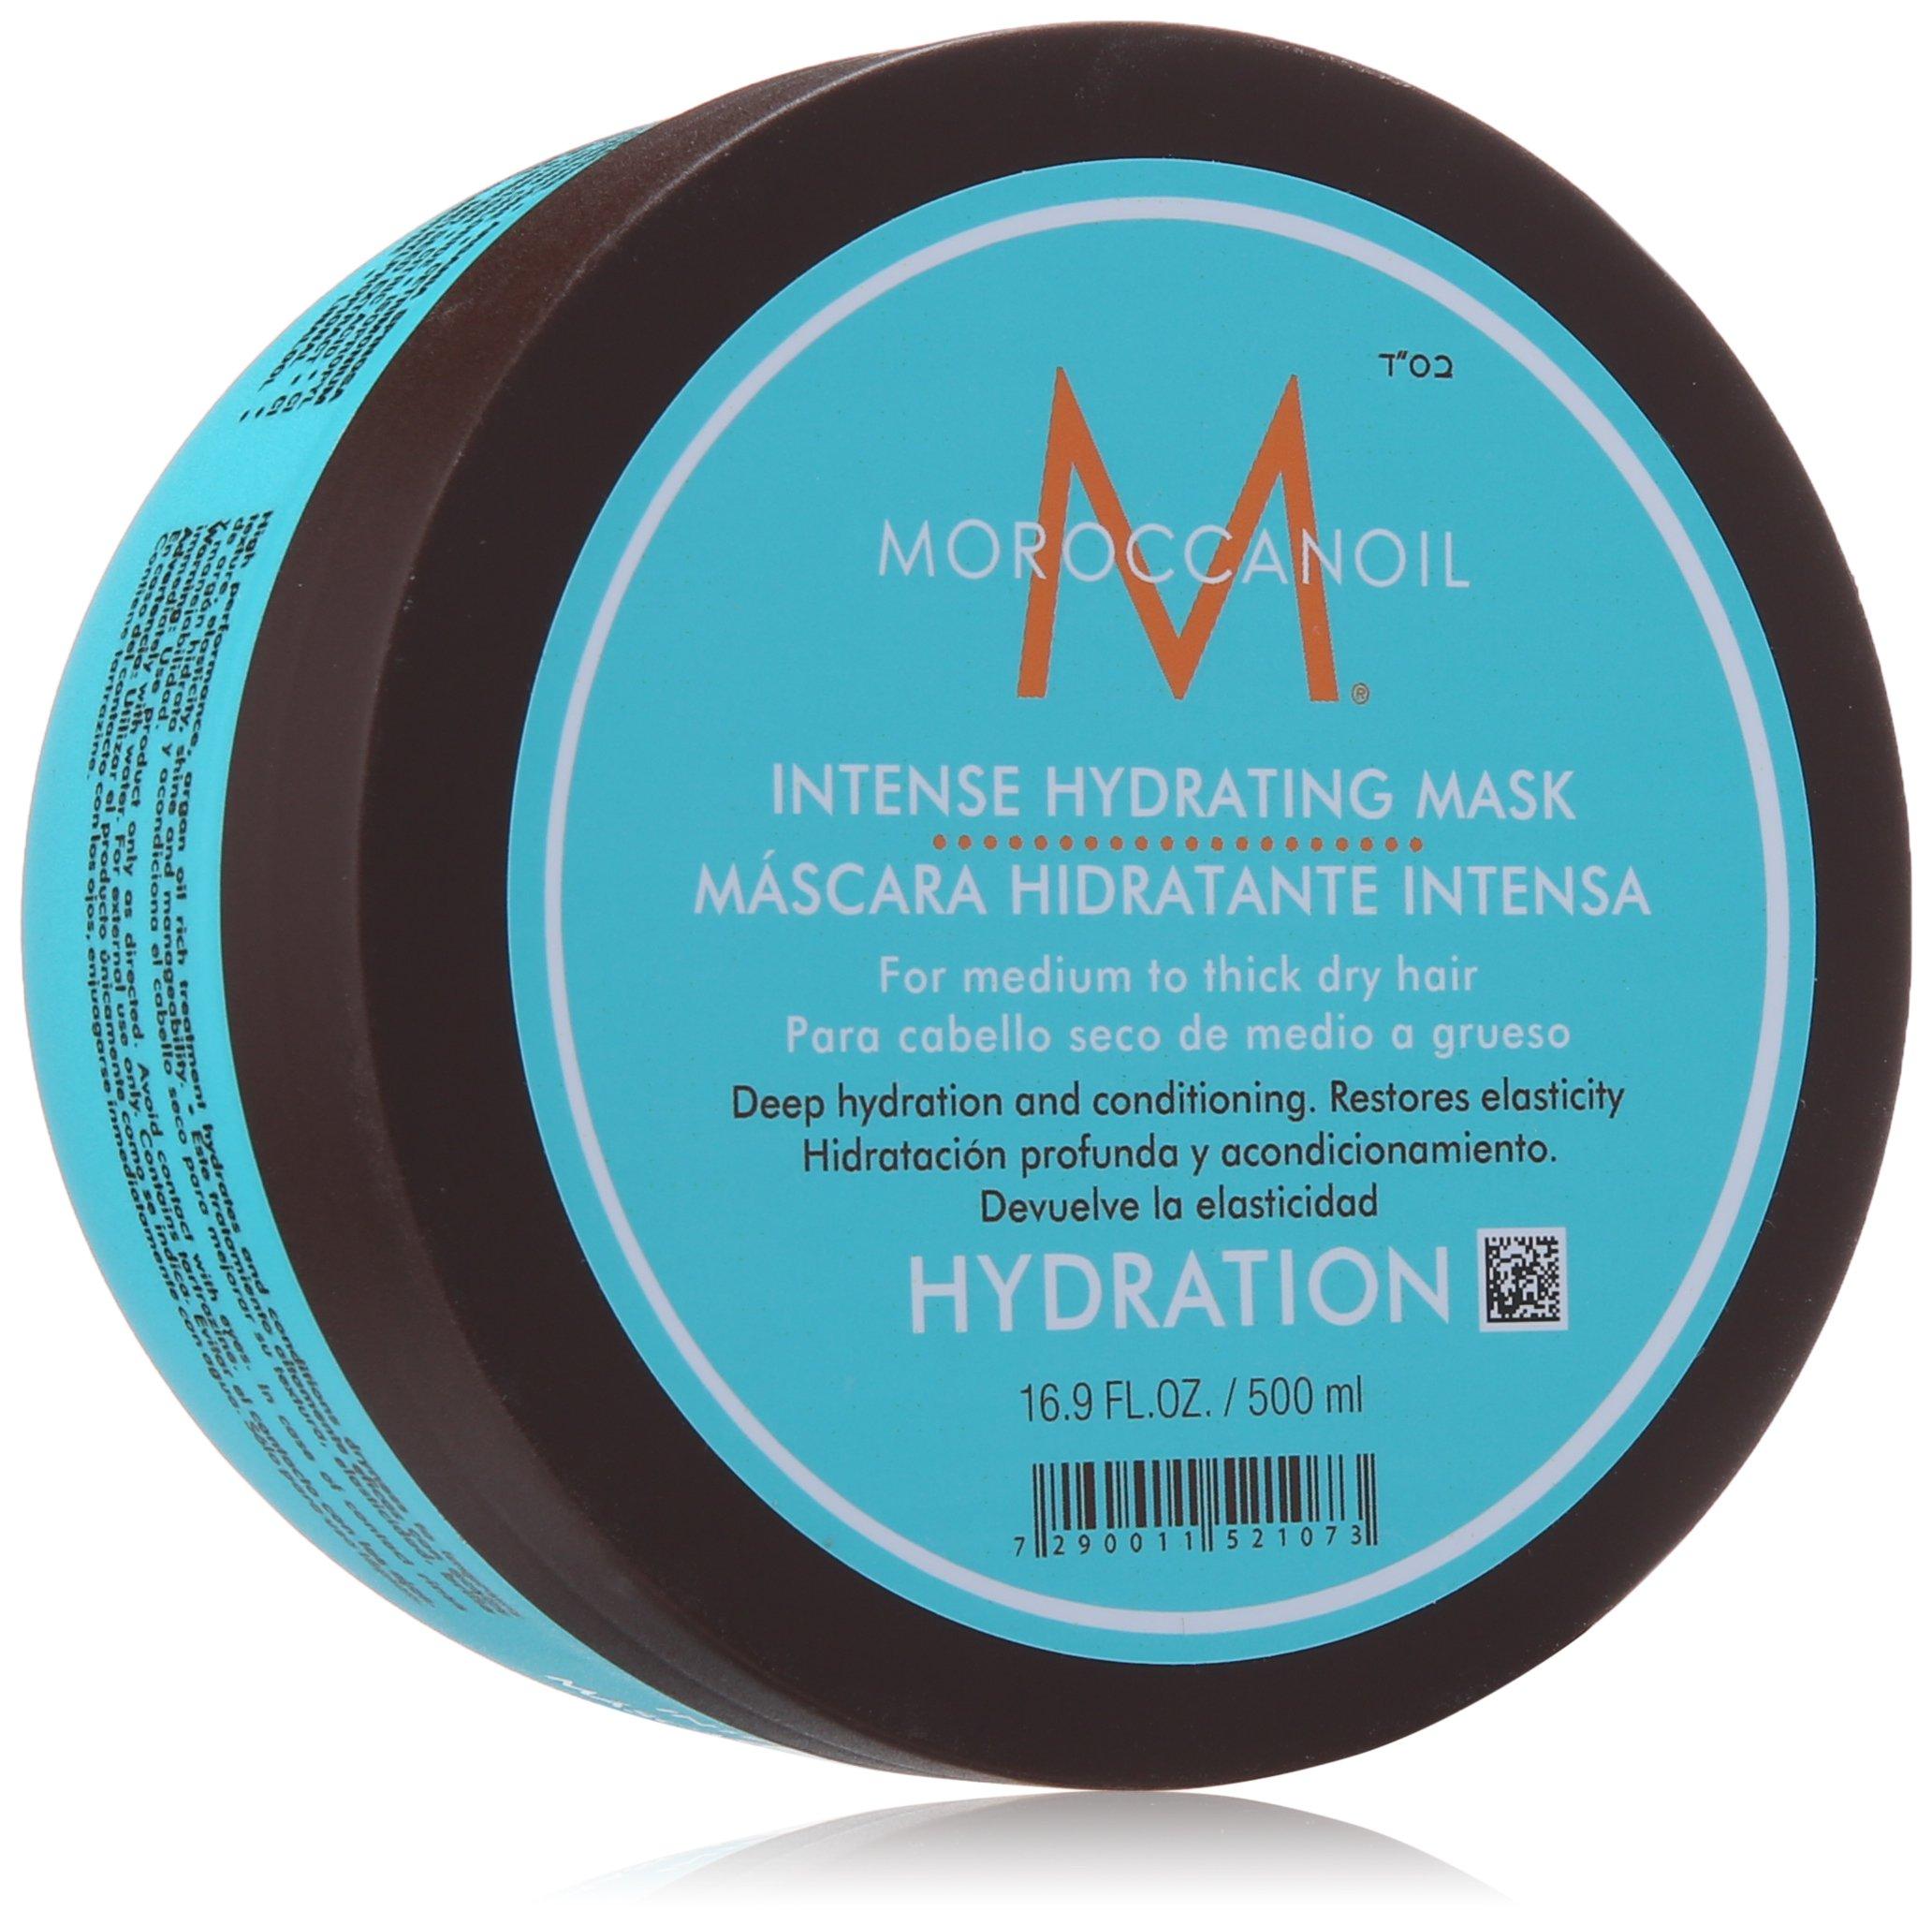 Moroccanoil Intense Hydrating Mask, 16.9-Ounce Jar